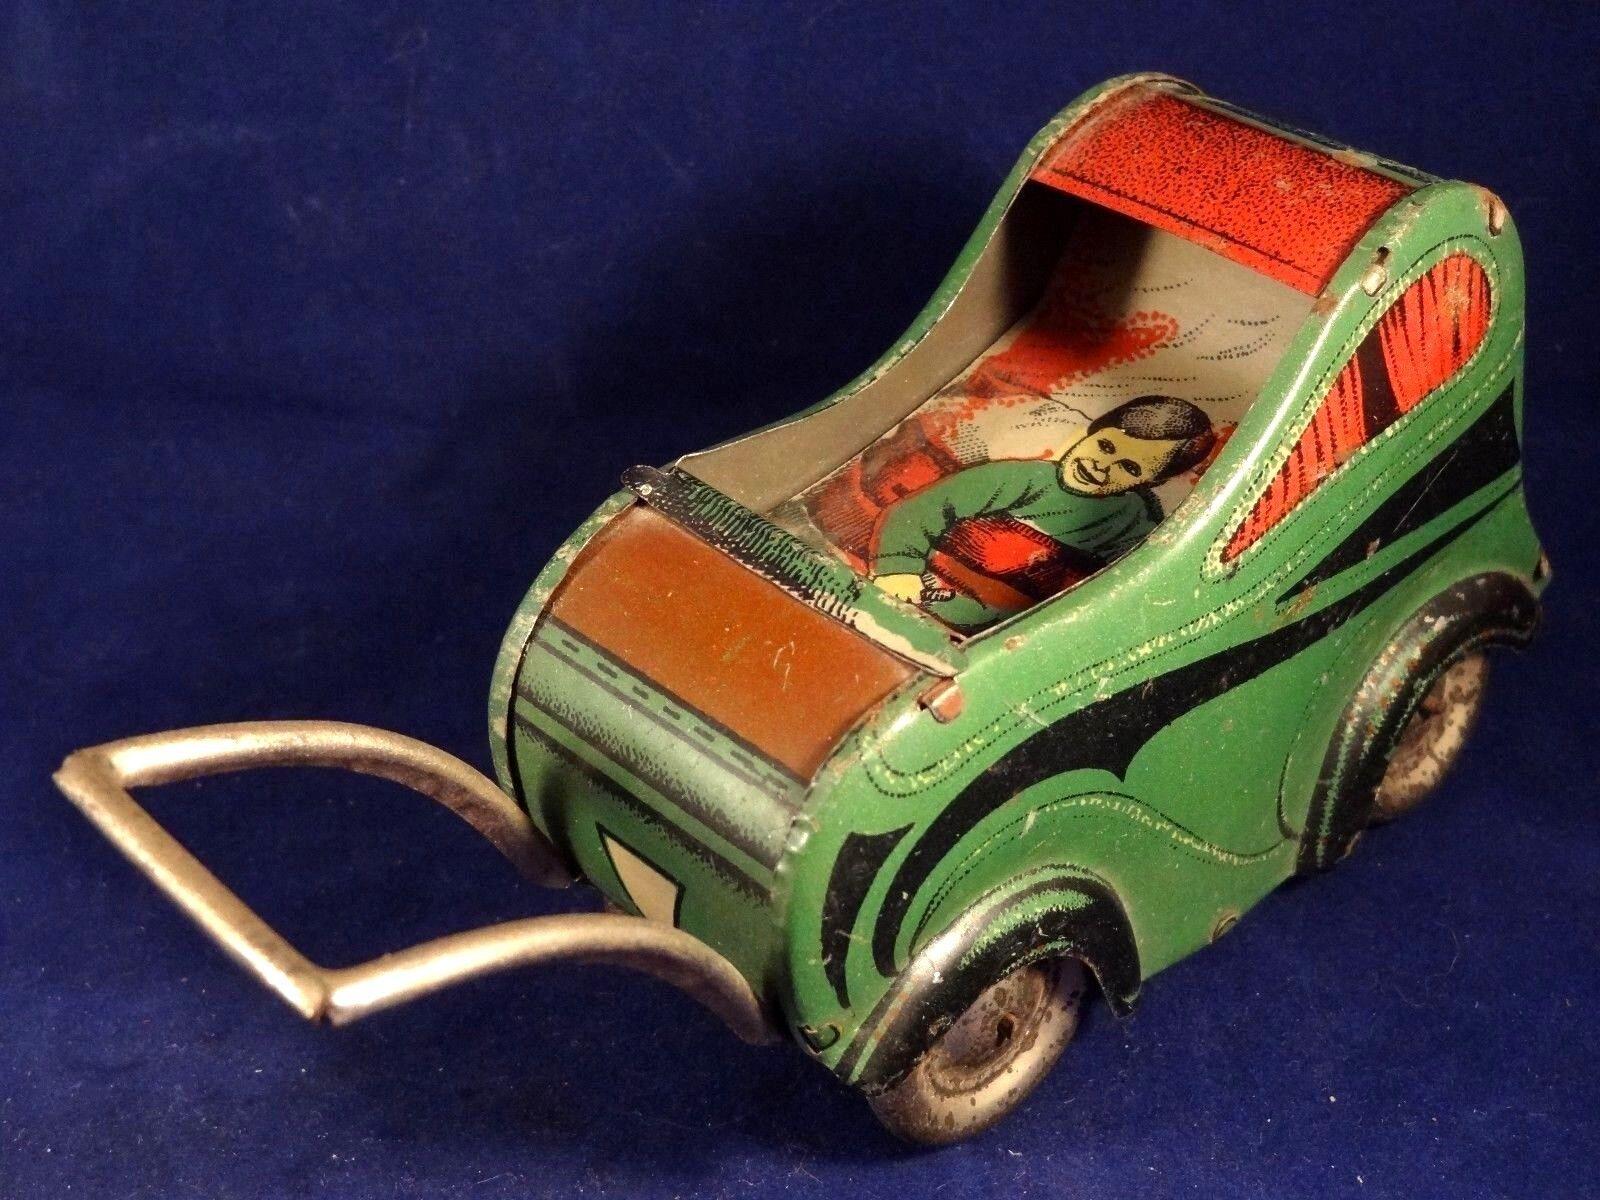 Ancien jouet landau tôle Bébé Bébé Bébé SFC Siro Ferrari Casalpusterlengo ITALY 1920 RARE 463607